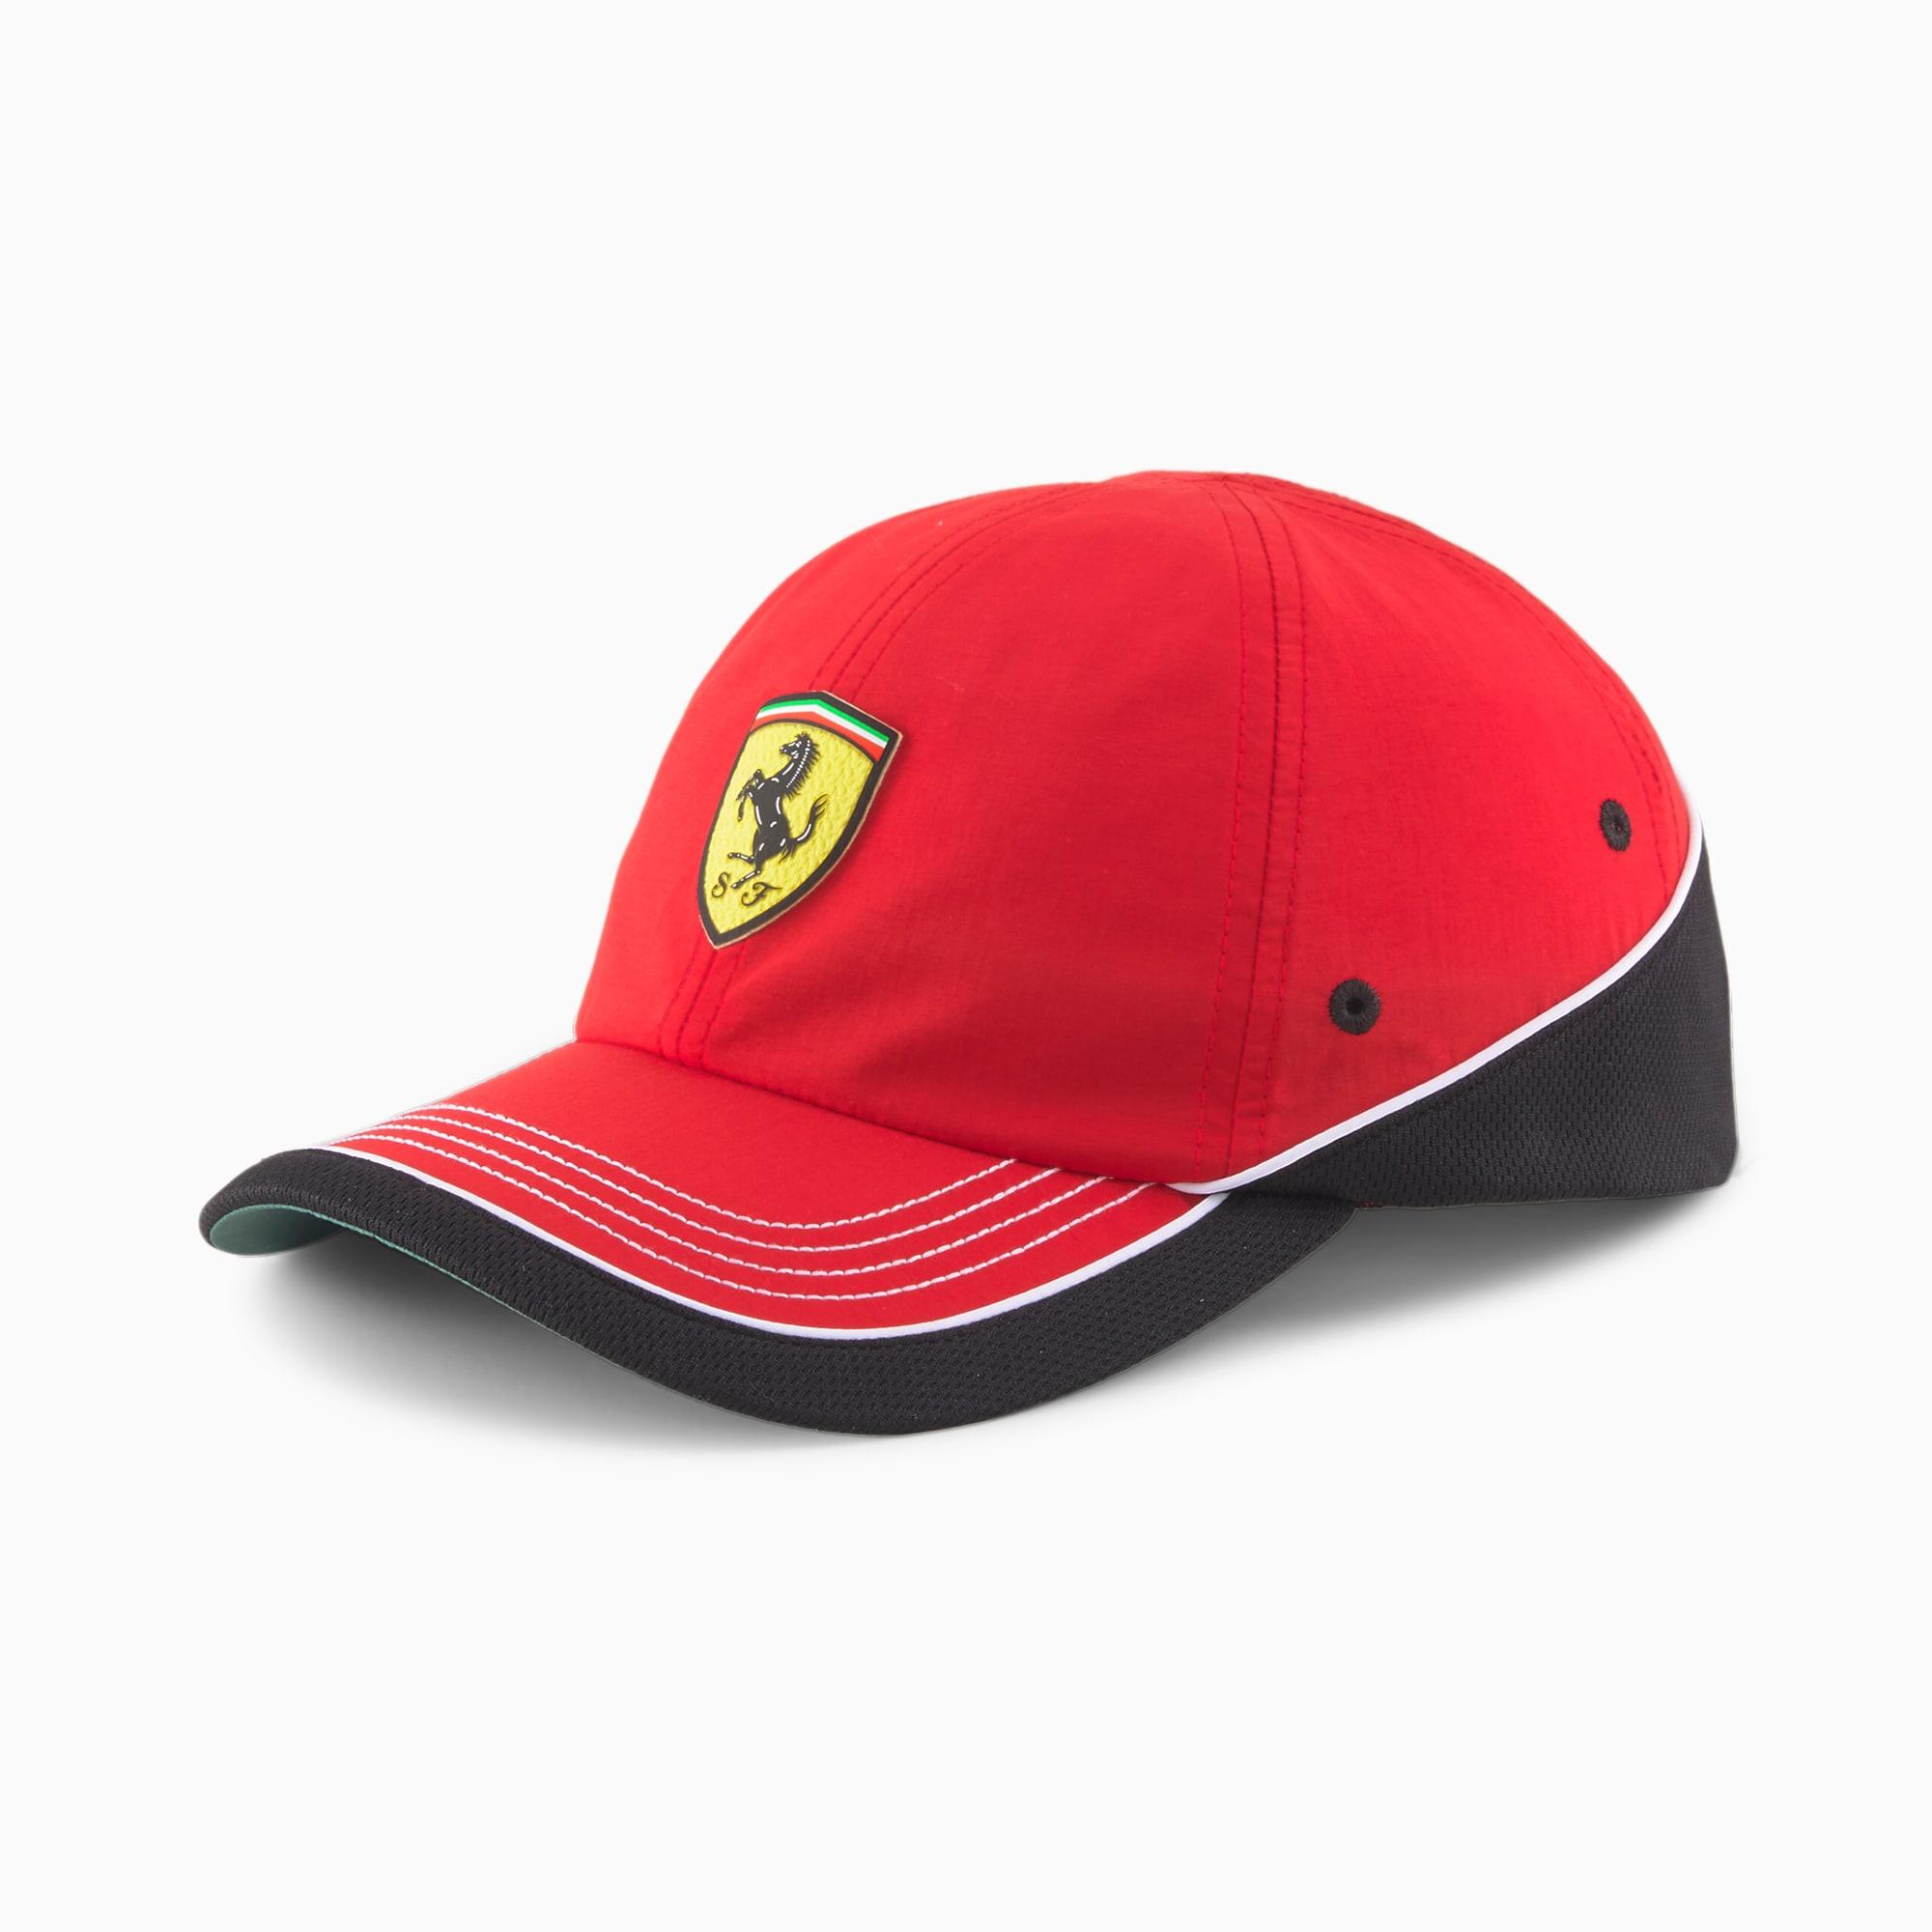 Casquette de baseball Scuderia Ferrari, Rouge, Accessoires - PUMA - Modalova